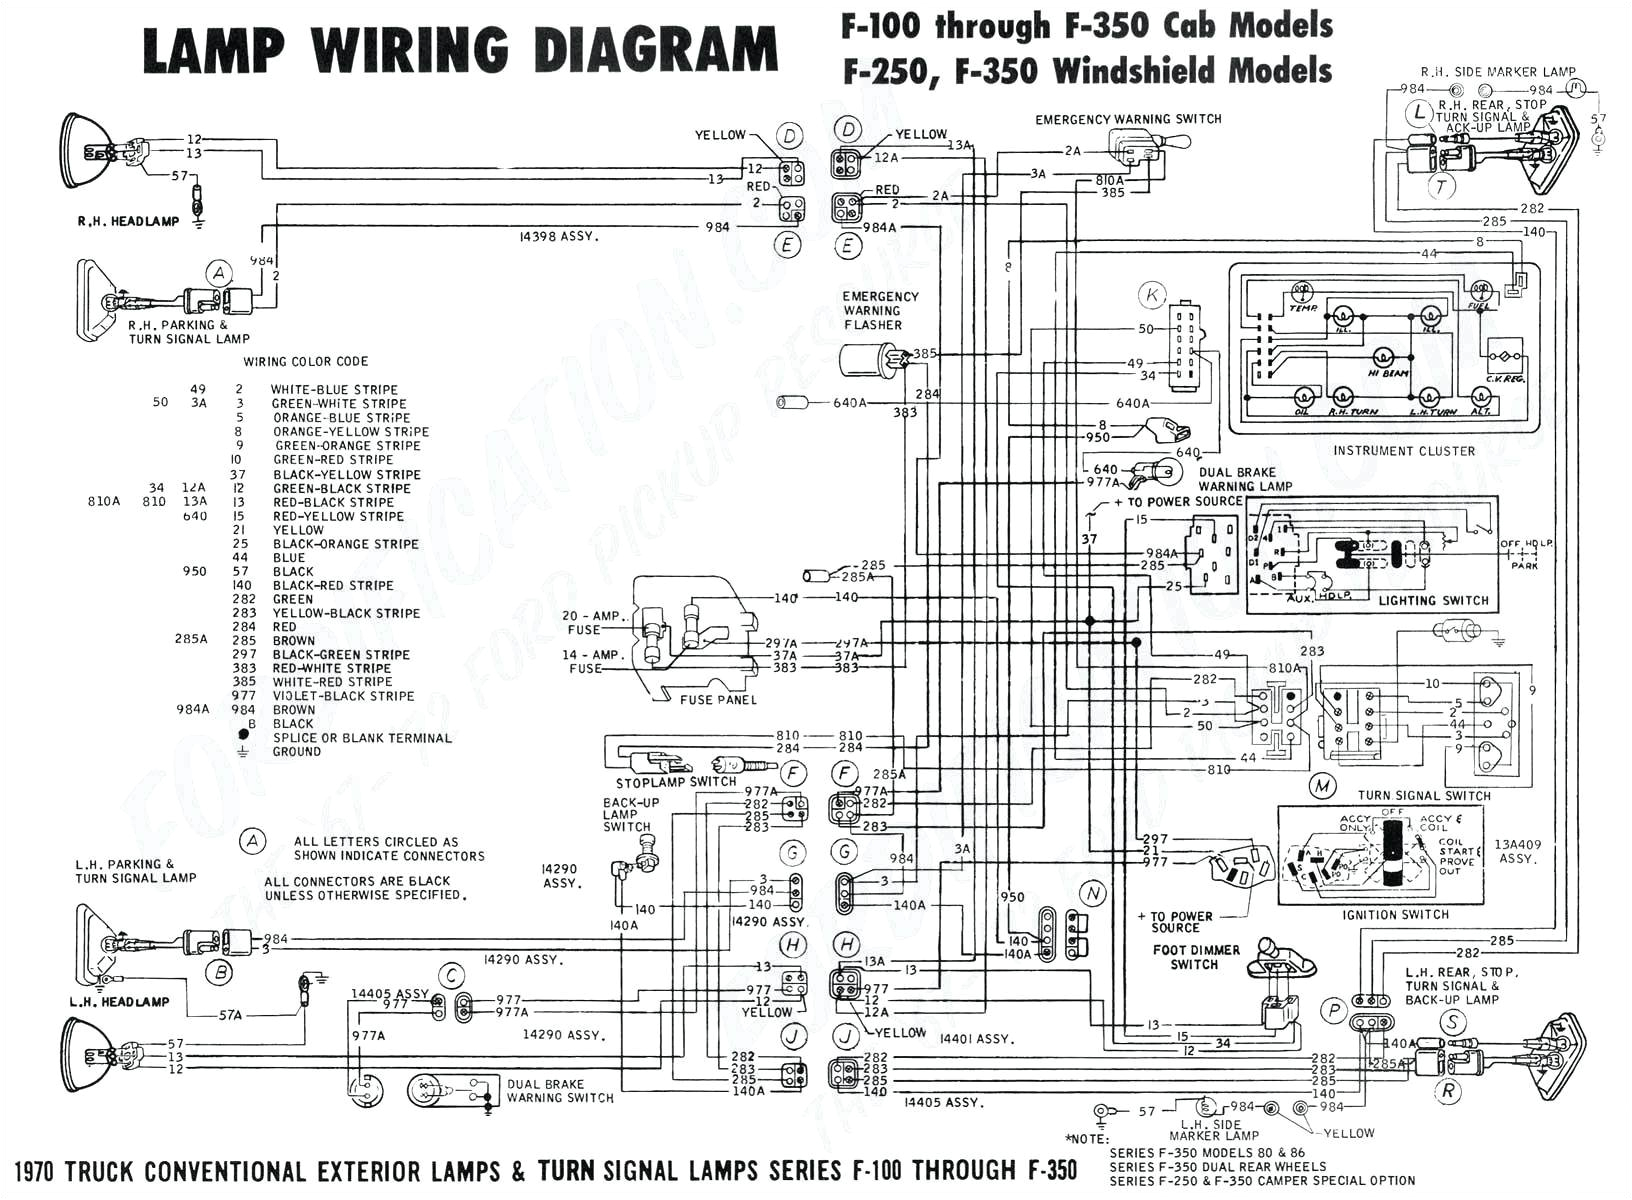 wiring diagram howstuffworks honda ridgeline wiring harness chevy 2008 ford f350 tail light wiring diagram wiring